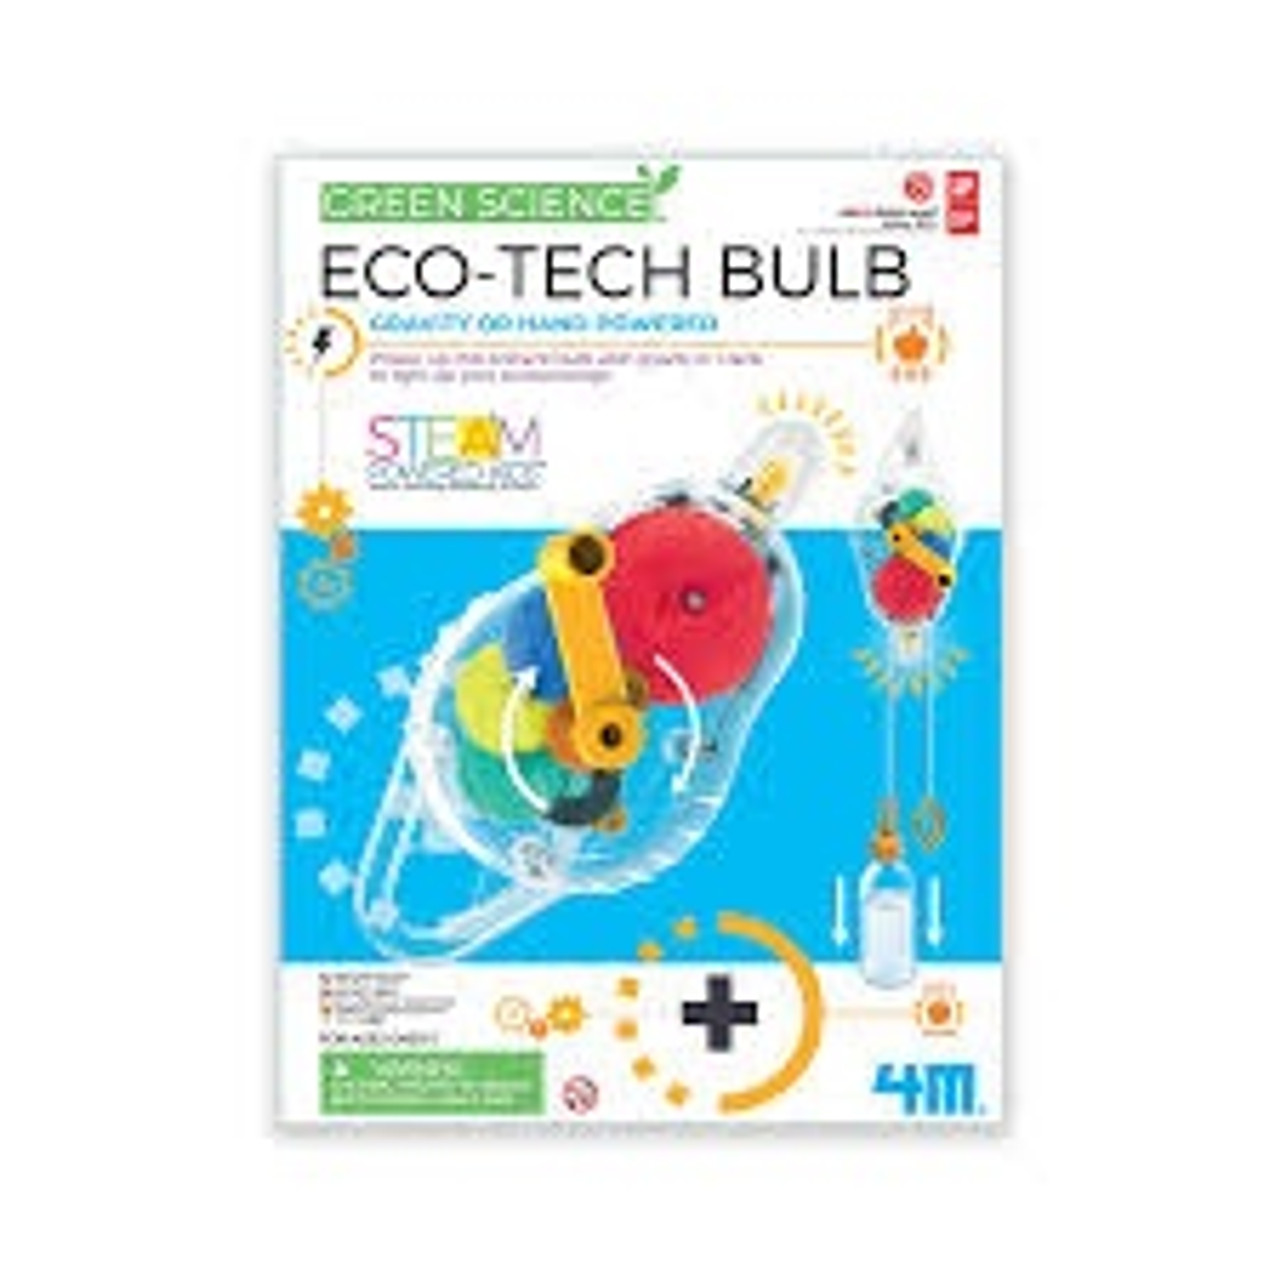 GREEN SCIENCE ECO-TECH BULB